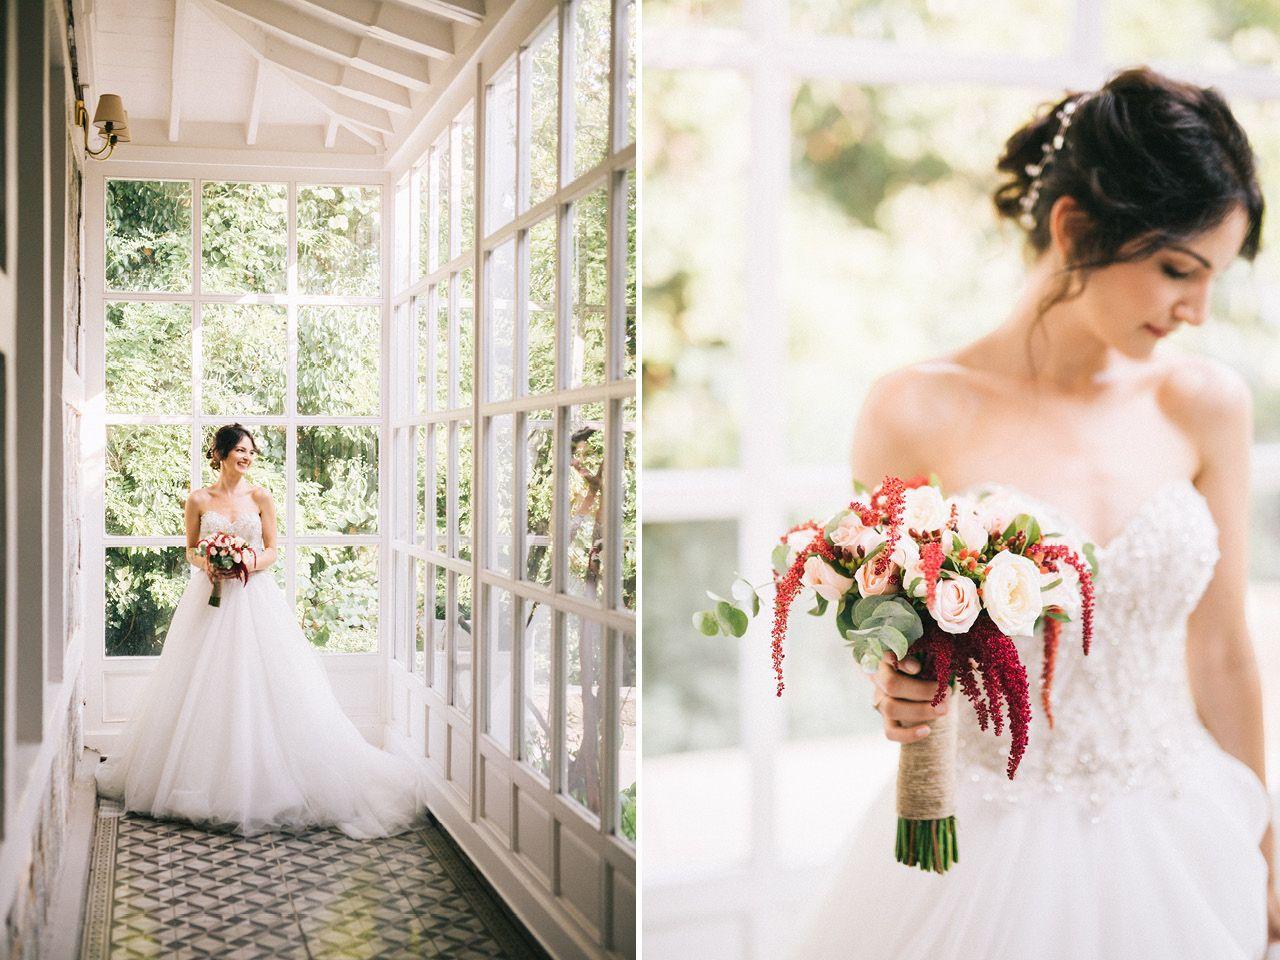 Elite wedding dresses  Bride Details  Kennedy Lodge Wedding With Beautiful Bosphorus View